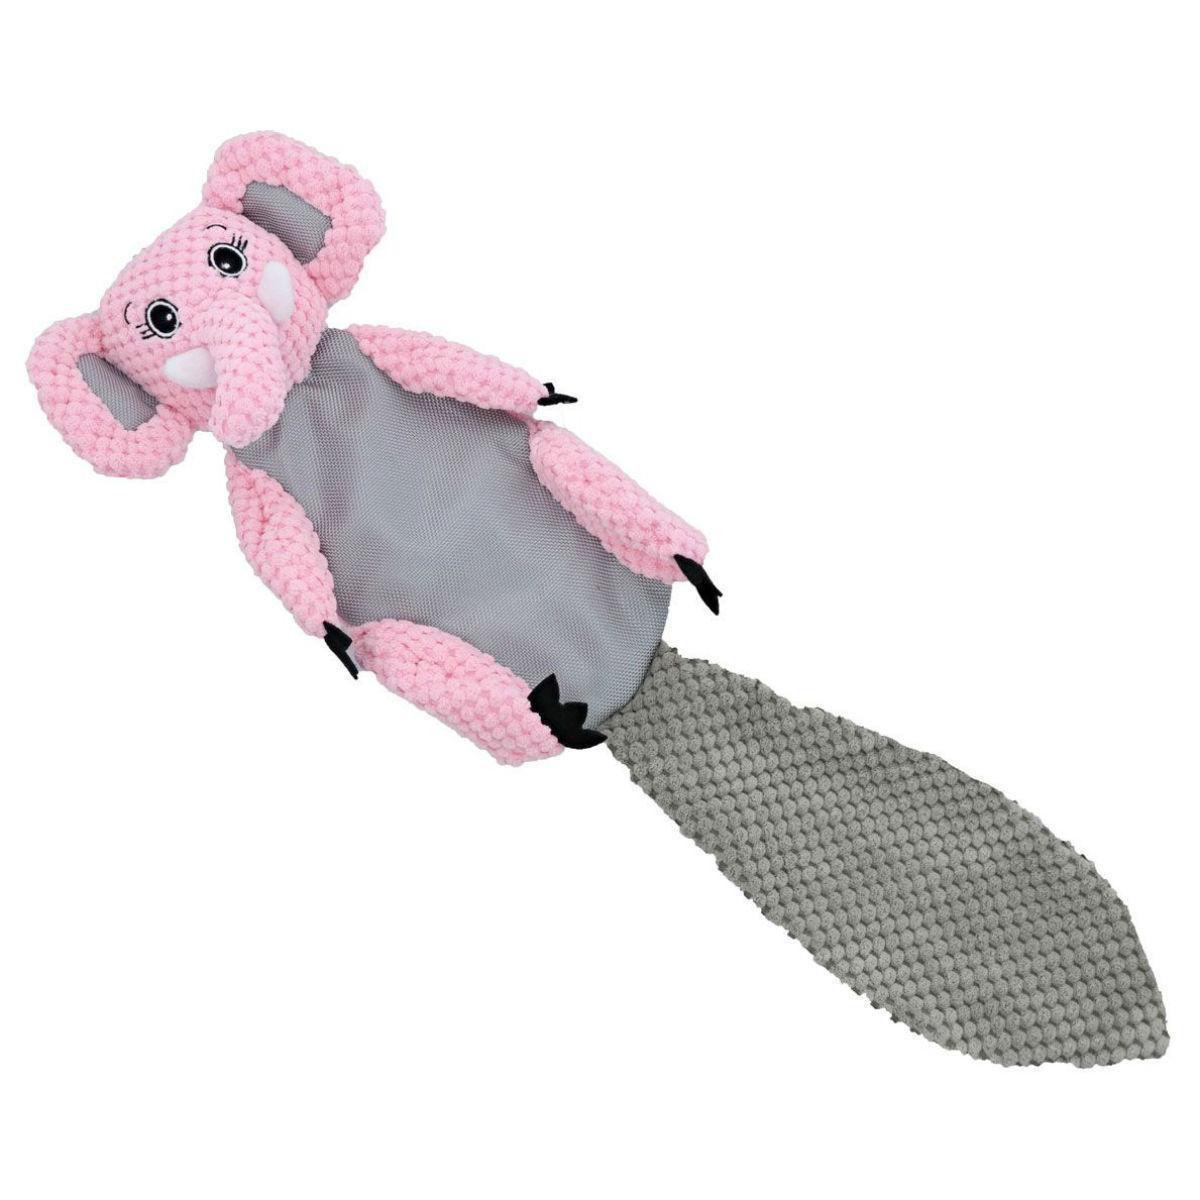 Play 365 Crinkle Flatty Dog Toy - Elephant